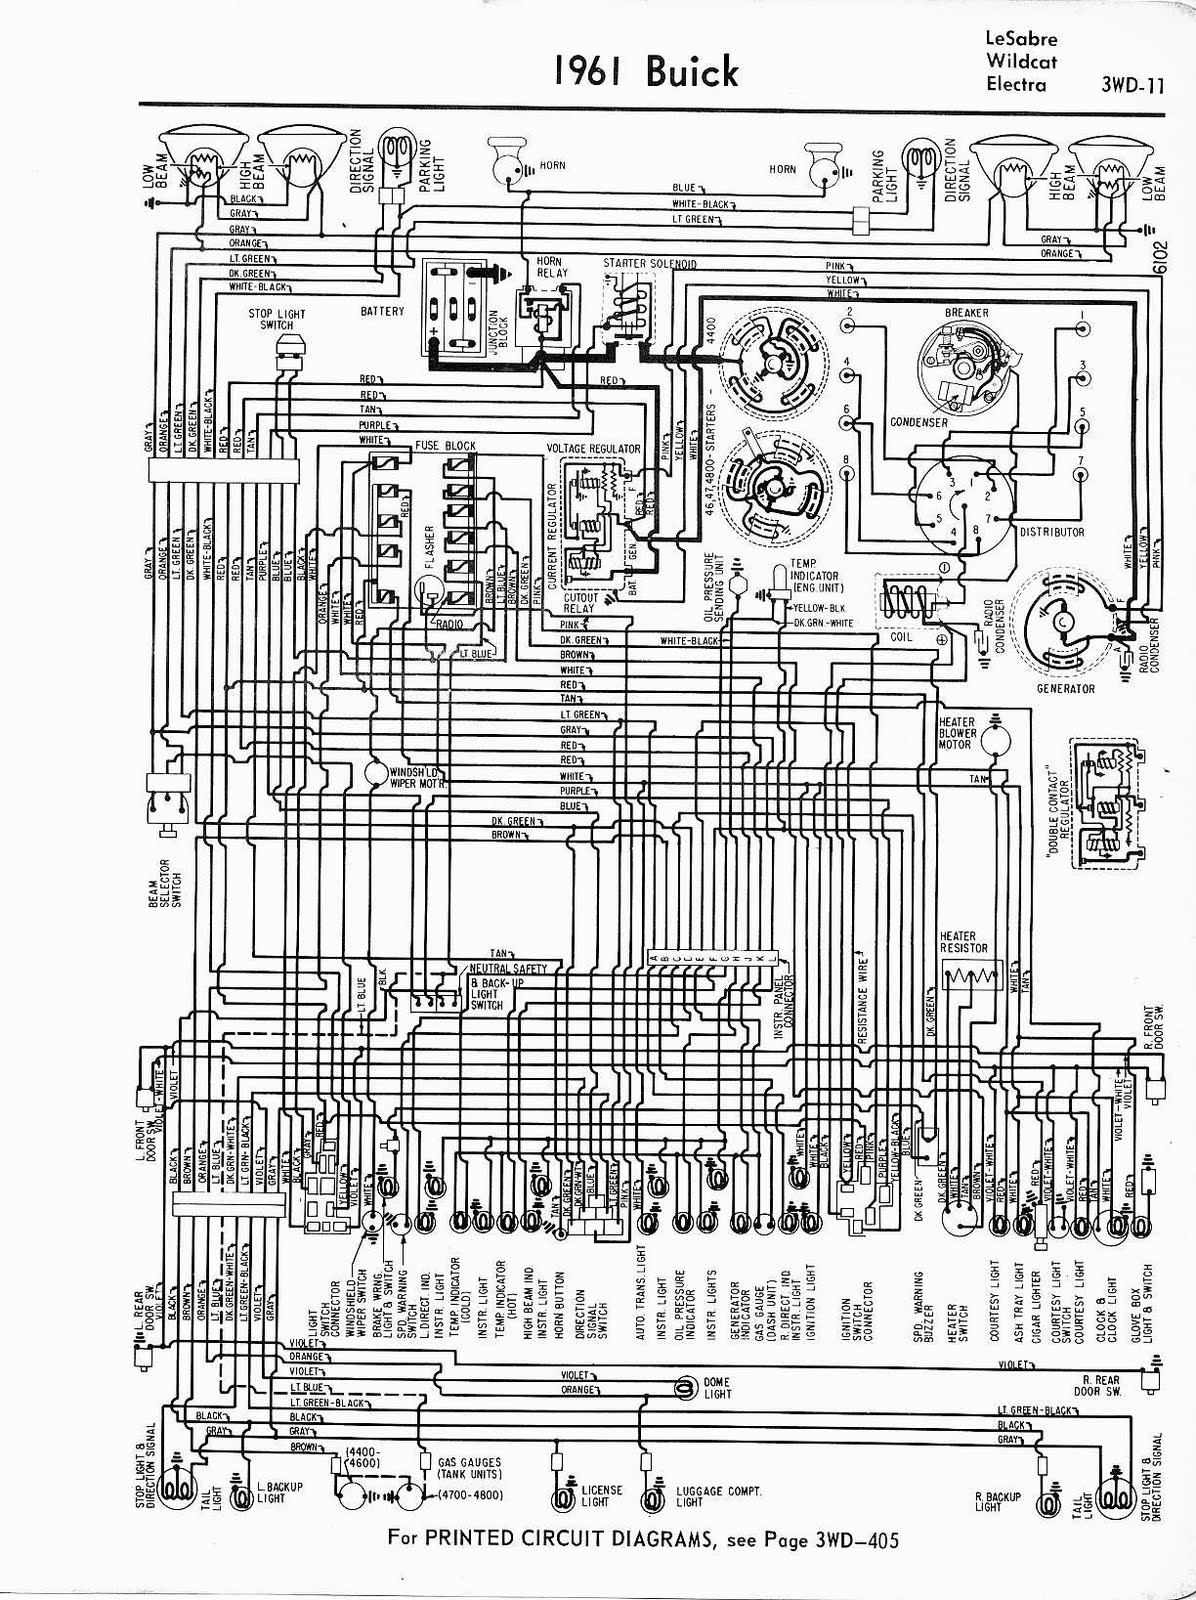 1964 buick skylark fuse box diagram wiring library1964 buick skylark fuse box diagram [ 1196 x 1600 Pixel ]